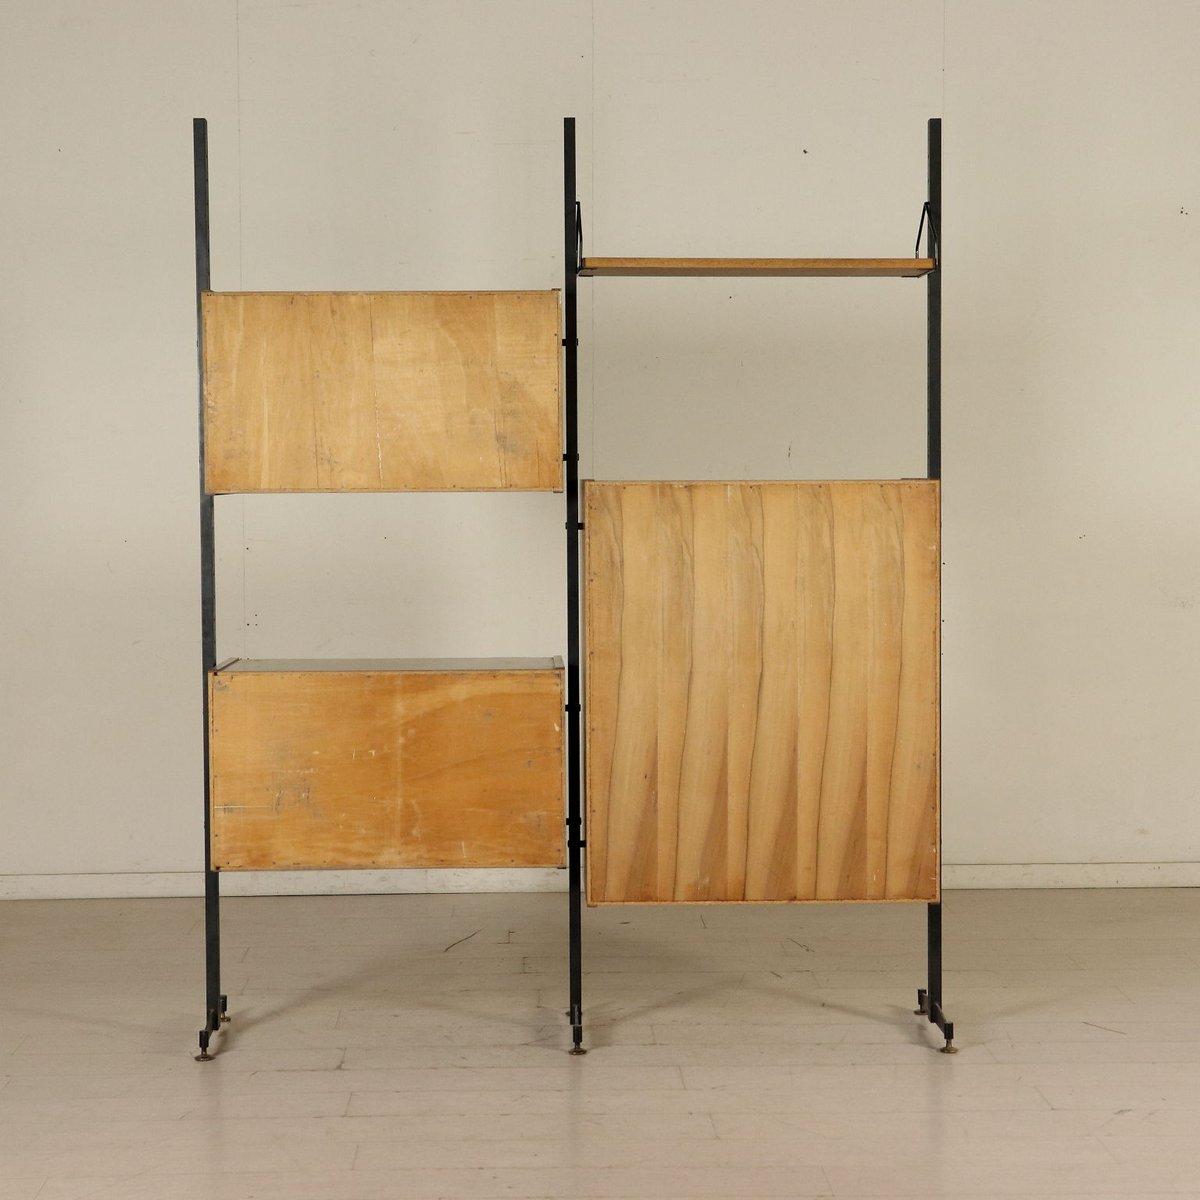 wandregal aus mahagoni furnier und metall 1960er bei pamono kaufen. Black Bedroom Furniture Sets. Home Design Ideas